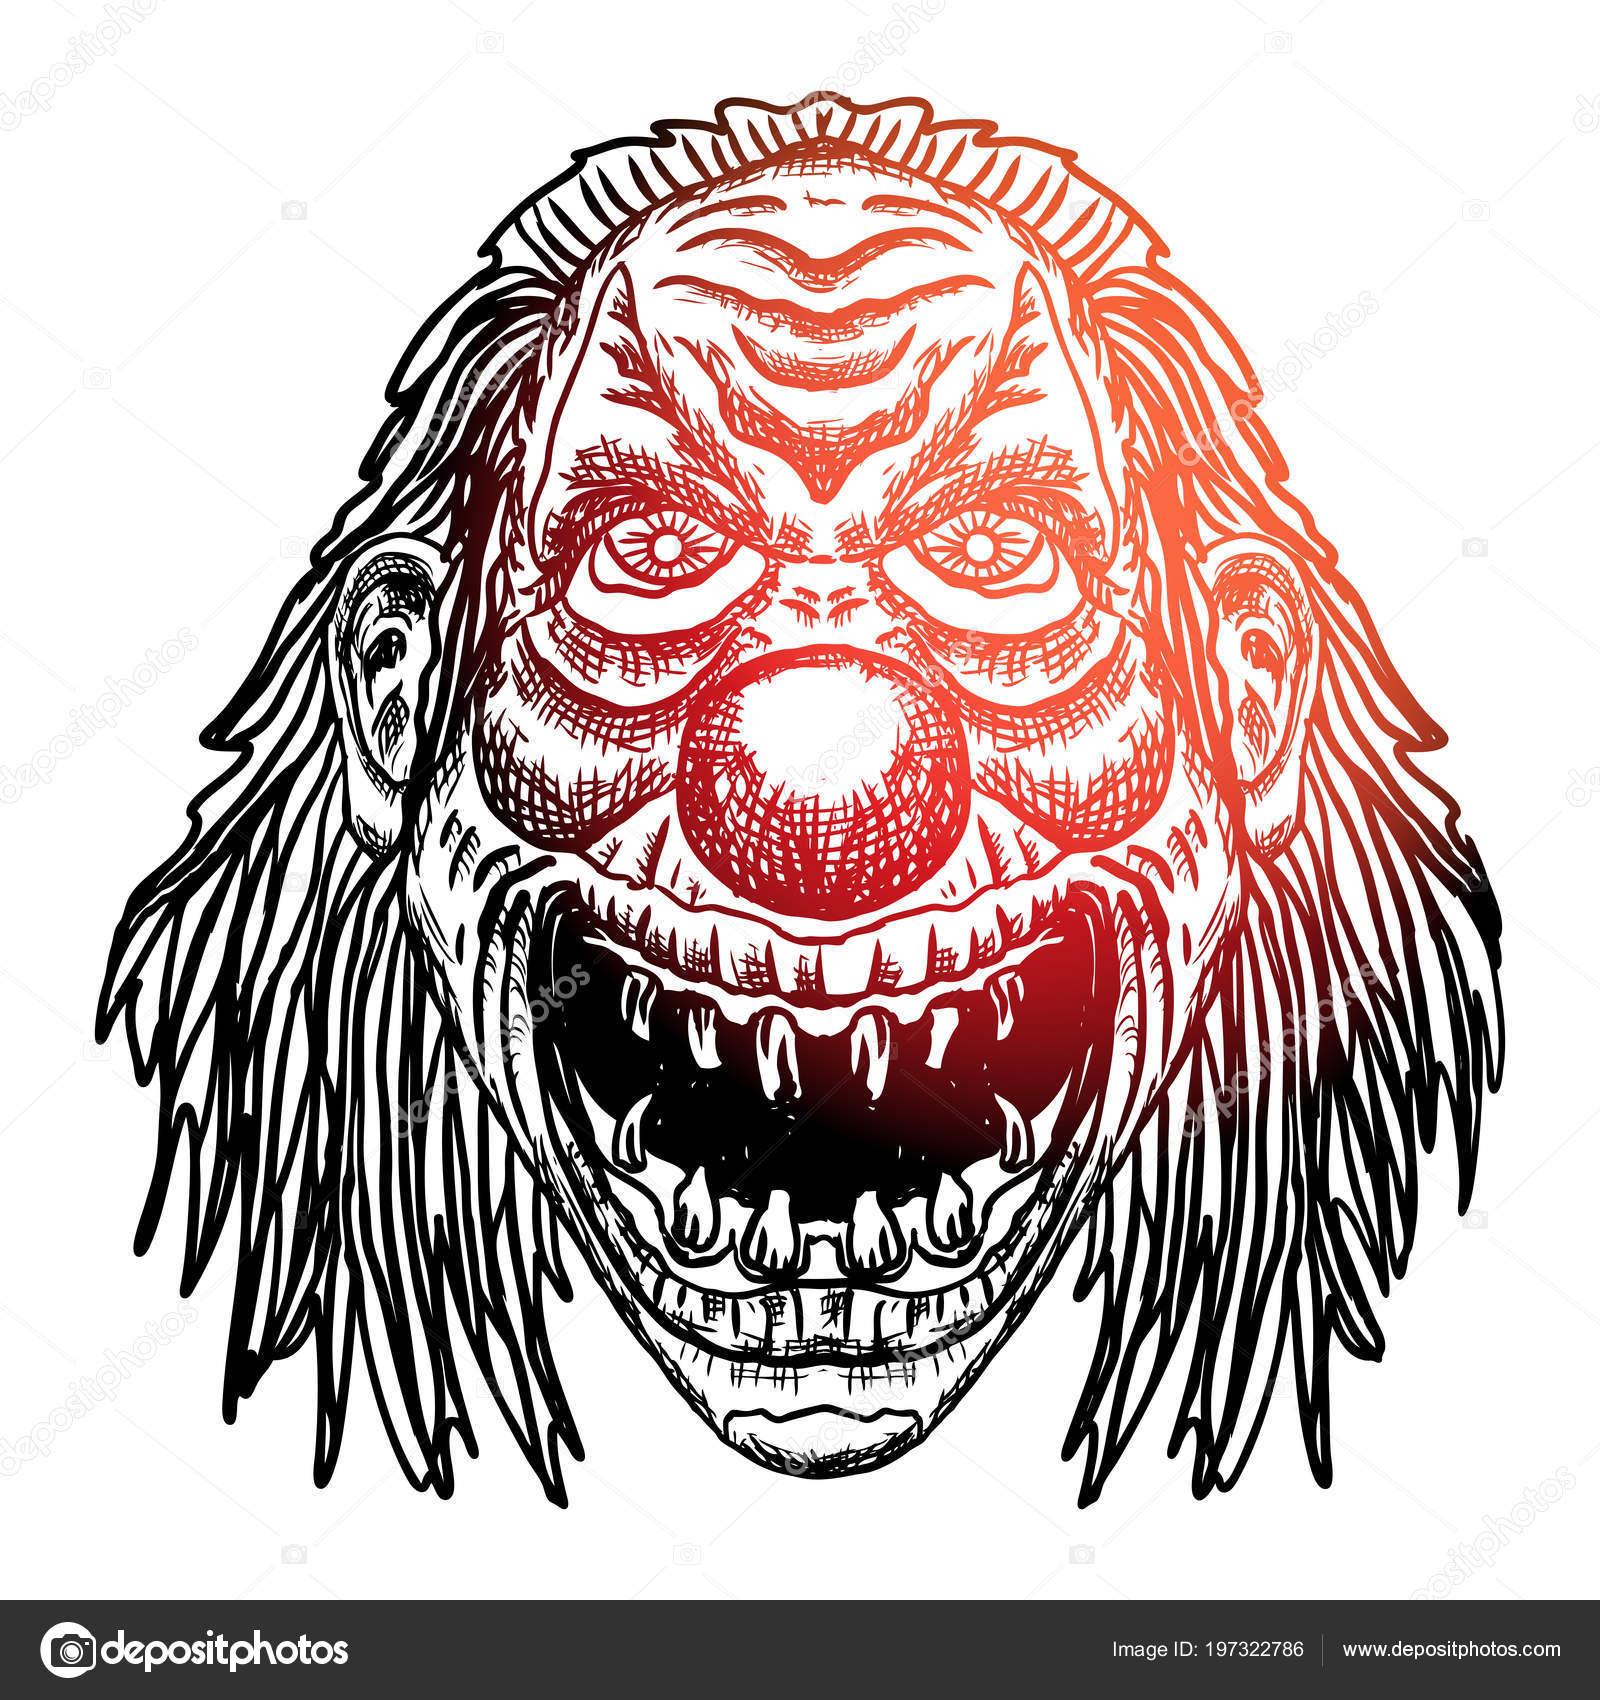 Blackwork Chair Adultes Tatouage Concept Tete Clown Diable Inspiree